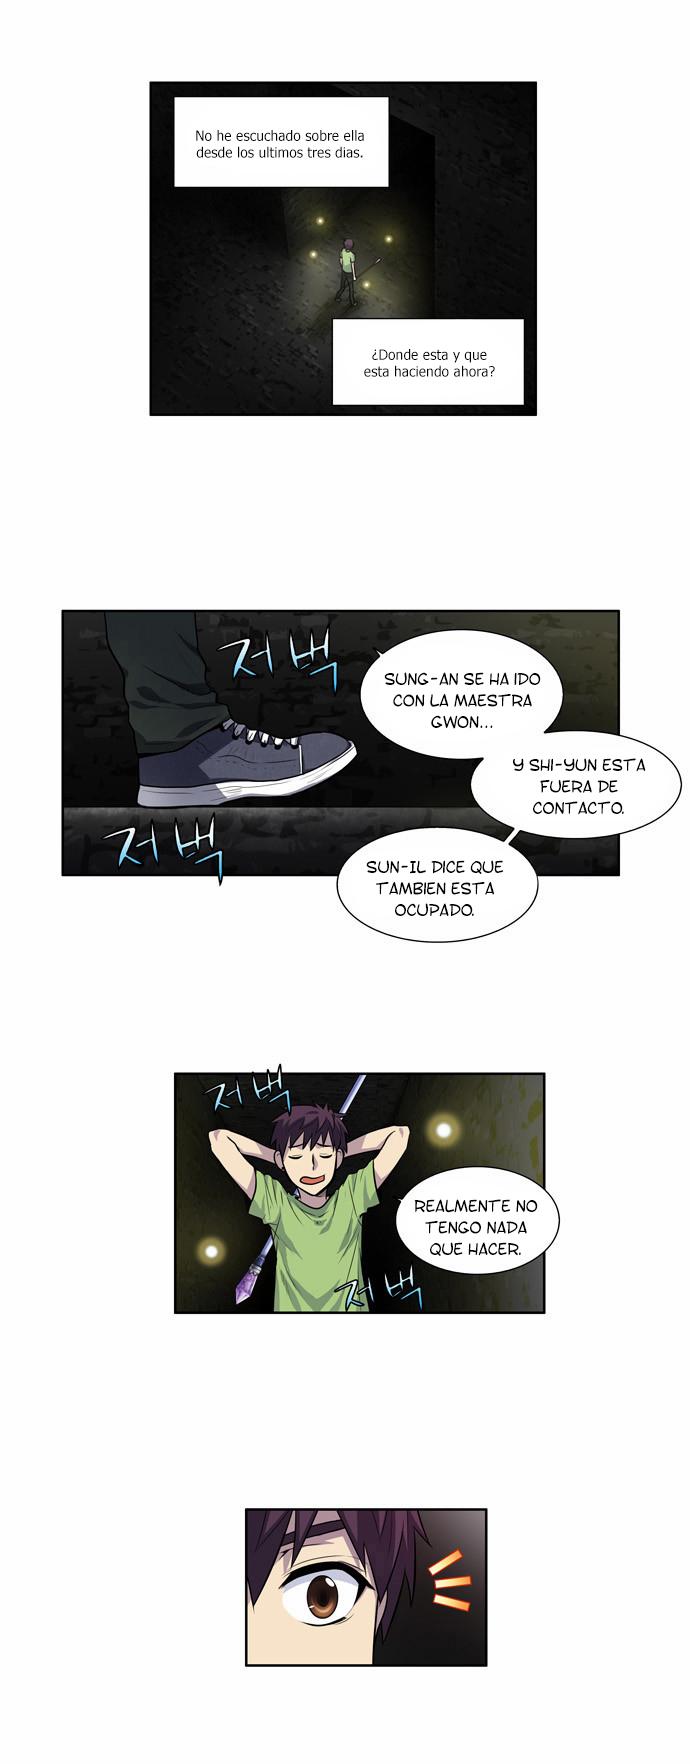 http://c5.ninemanga.com/es_manga/61/1725/420034/5c22590152f4f53f3c05cf7cc6aa0b6b.jpg Page 8